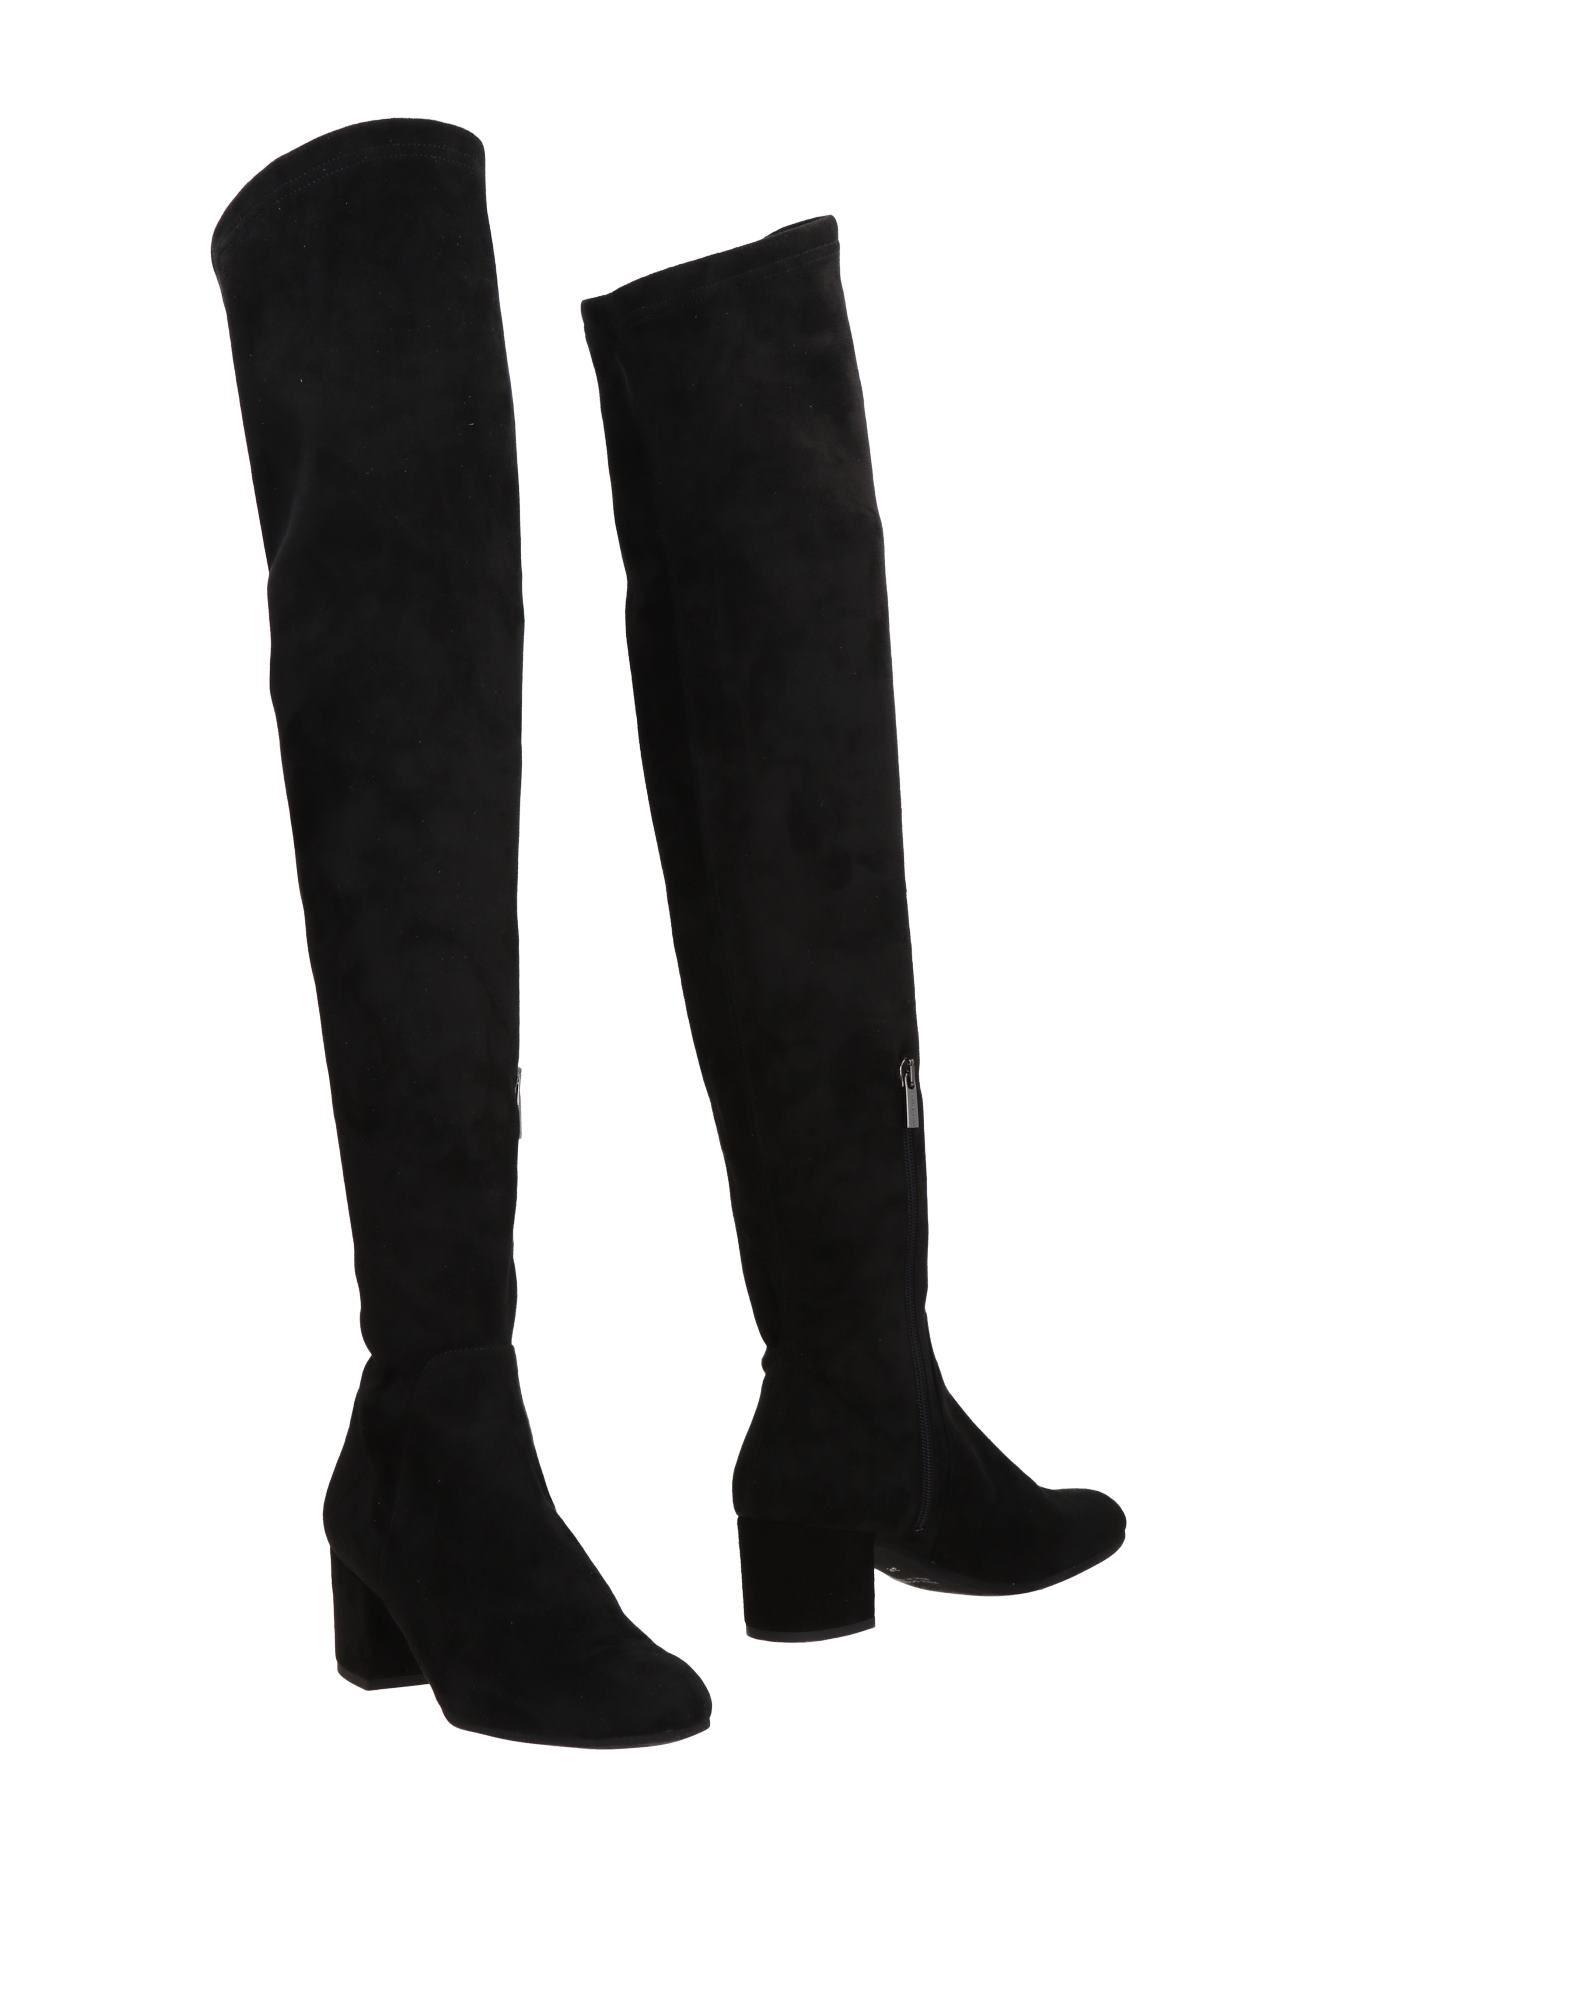 Michael Dass Stiefel Damen  Qualität 11501756DI Gute Qualität  beliebte Schuhe 2c570b